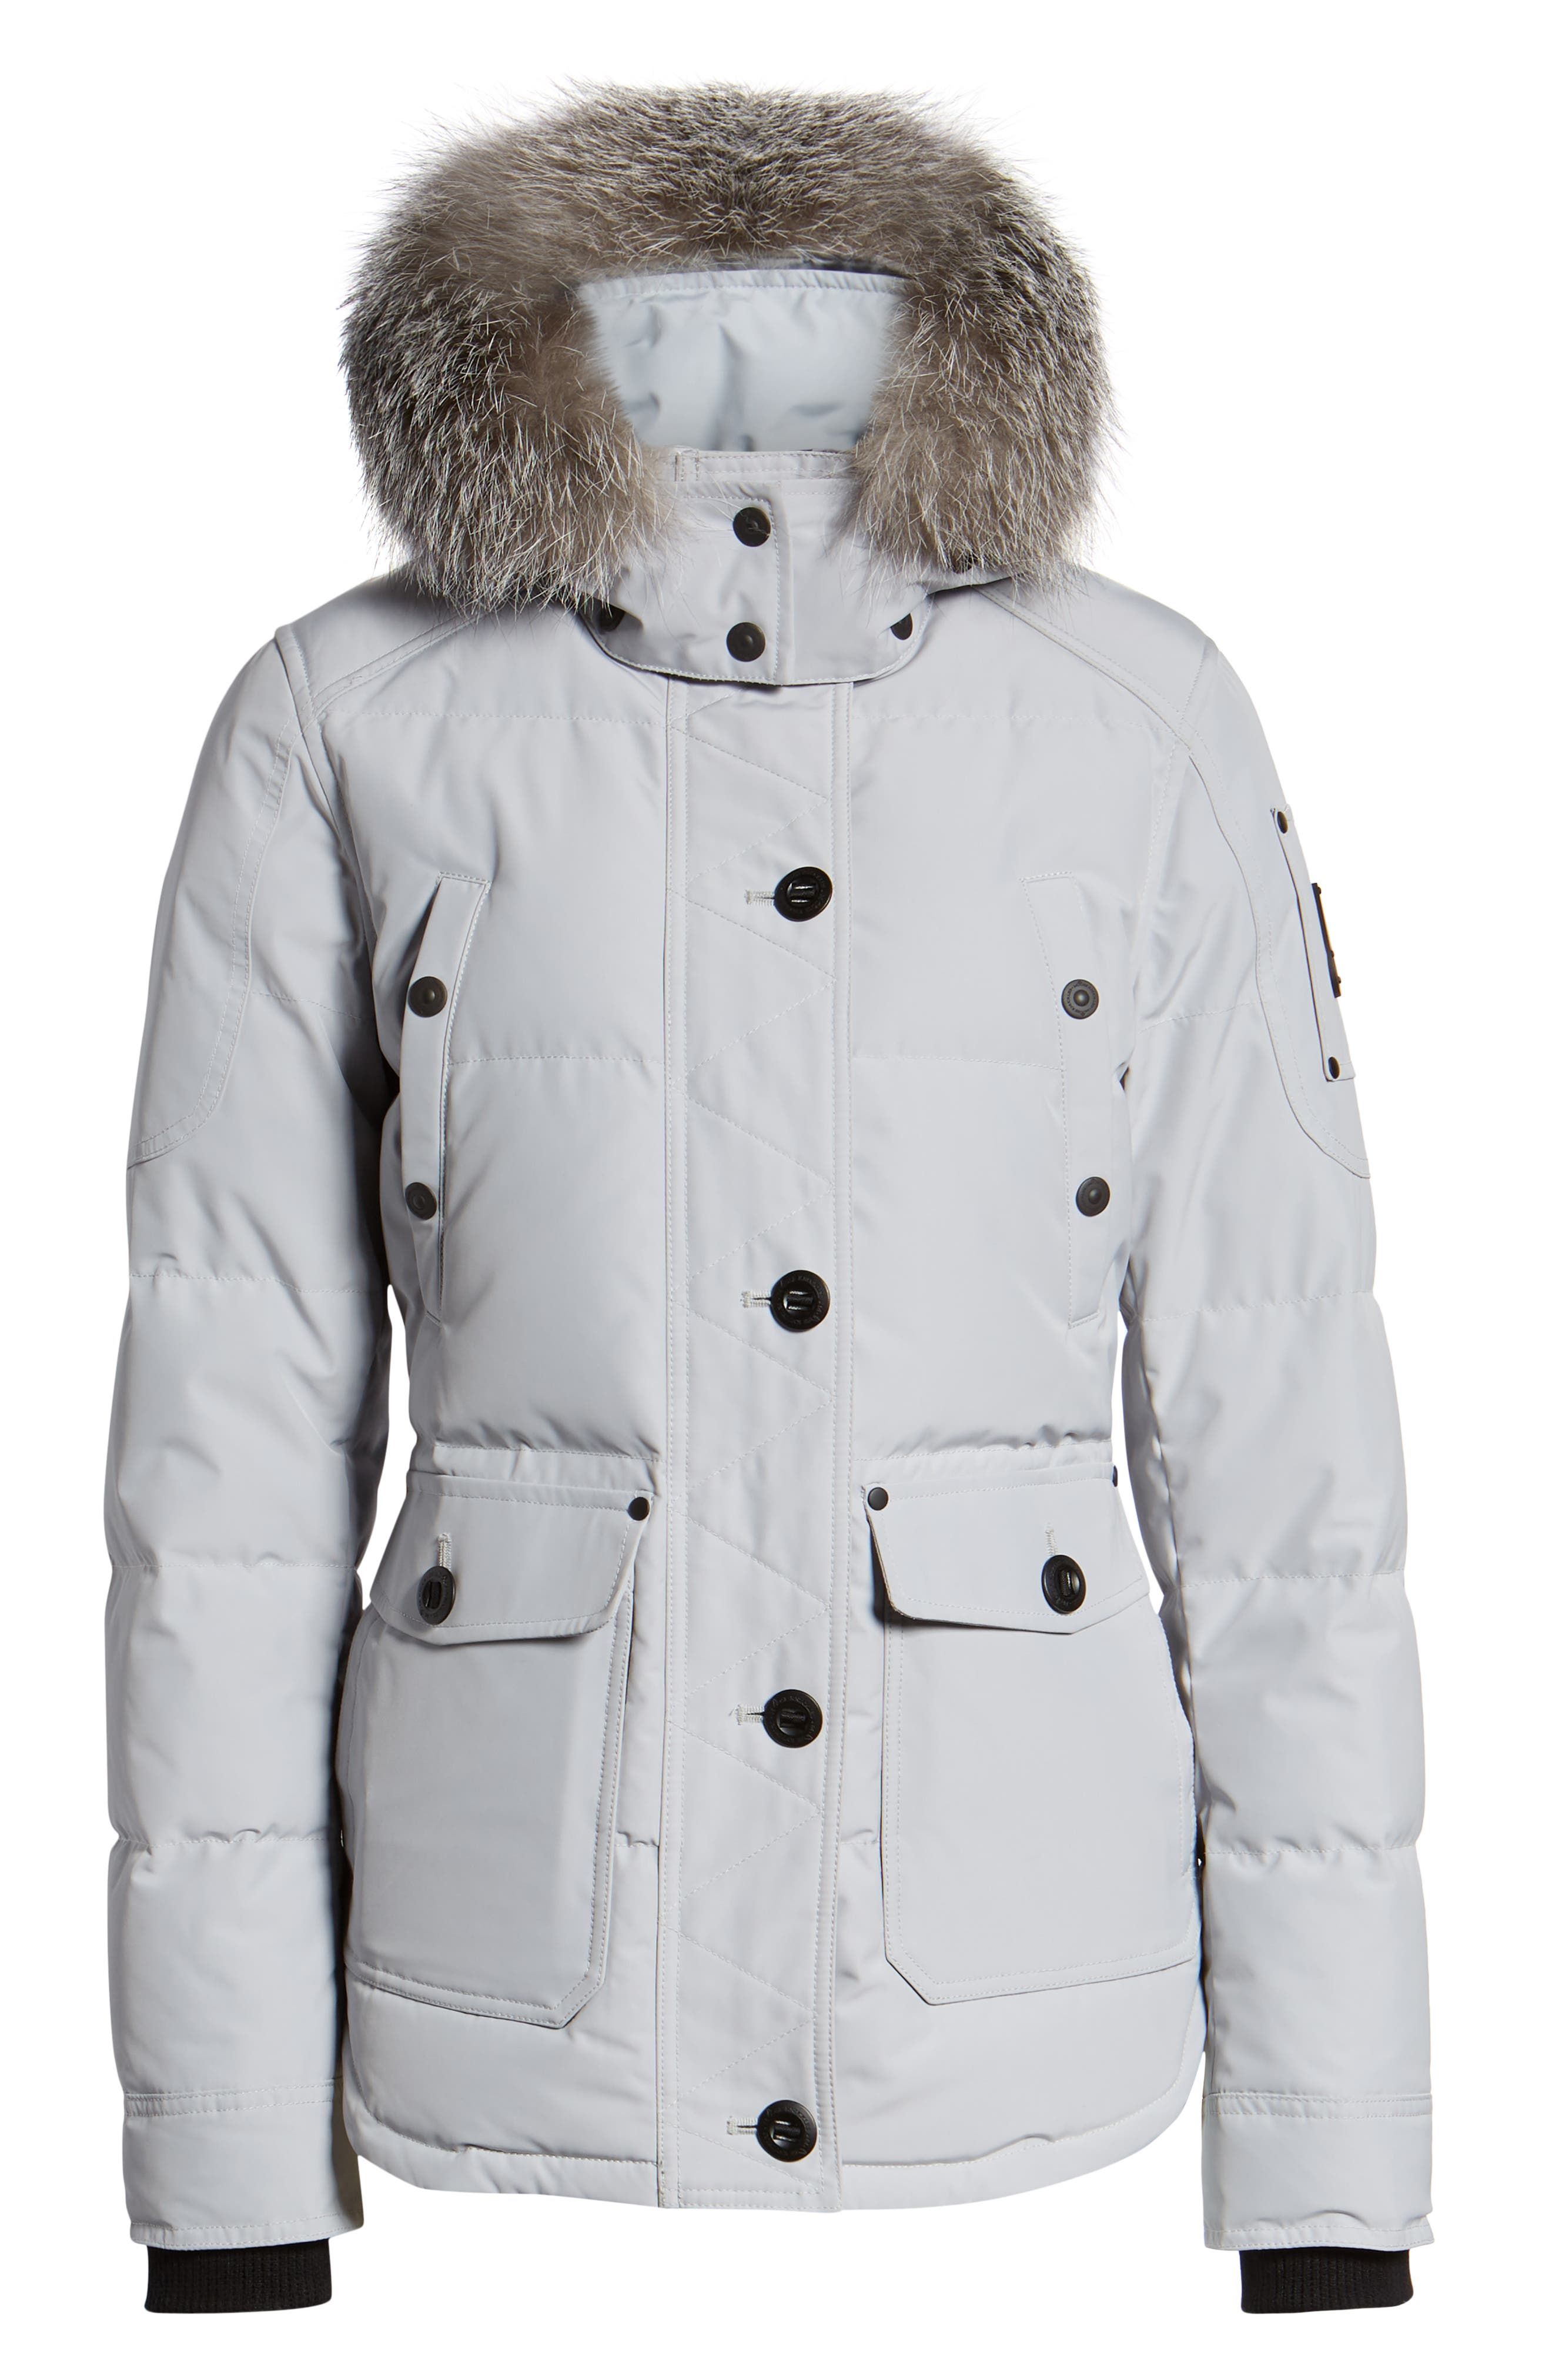 MOOSE KNUCKLES, Debaies Genuine Fox Fur Trim Down Jacket, Alternate thumbnail 6, color, GRAY BIRCH/ FROST FOX